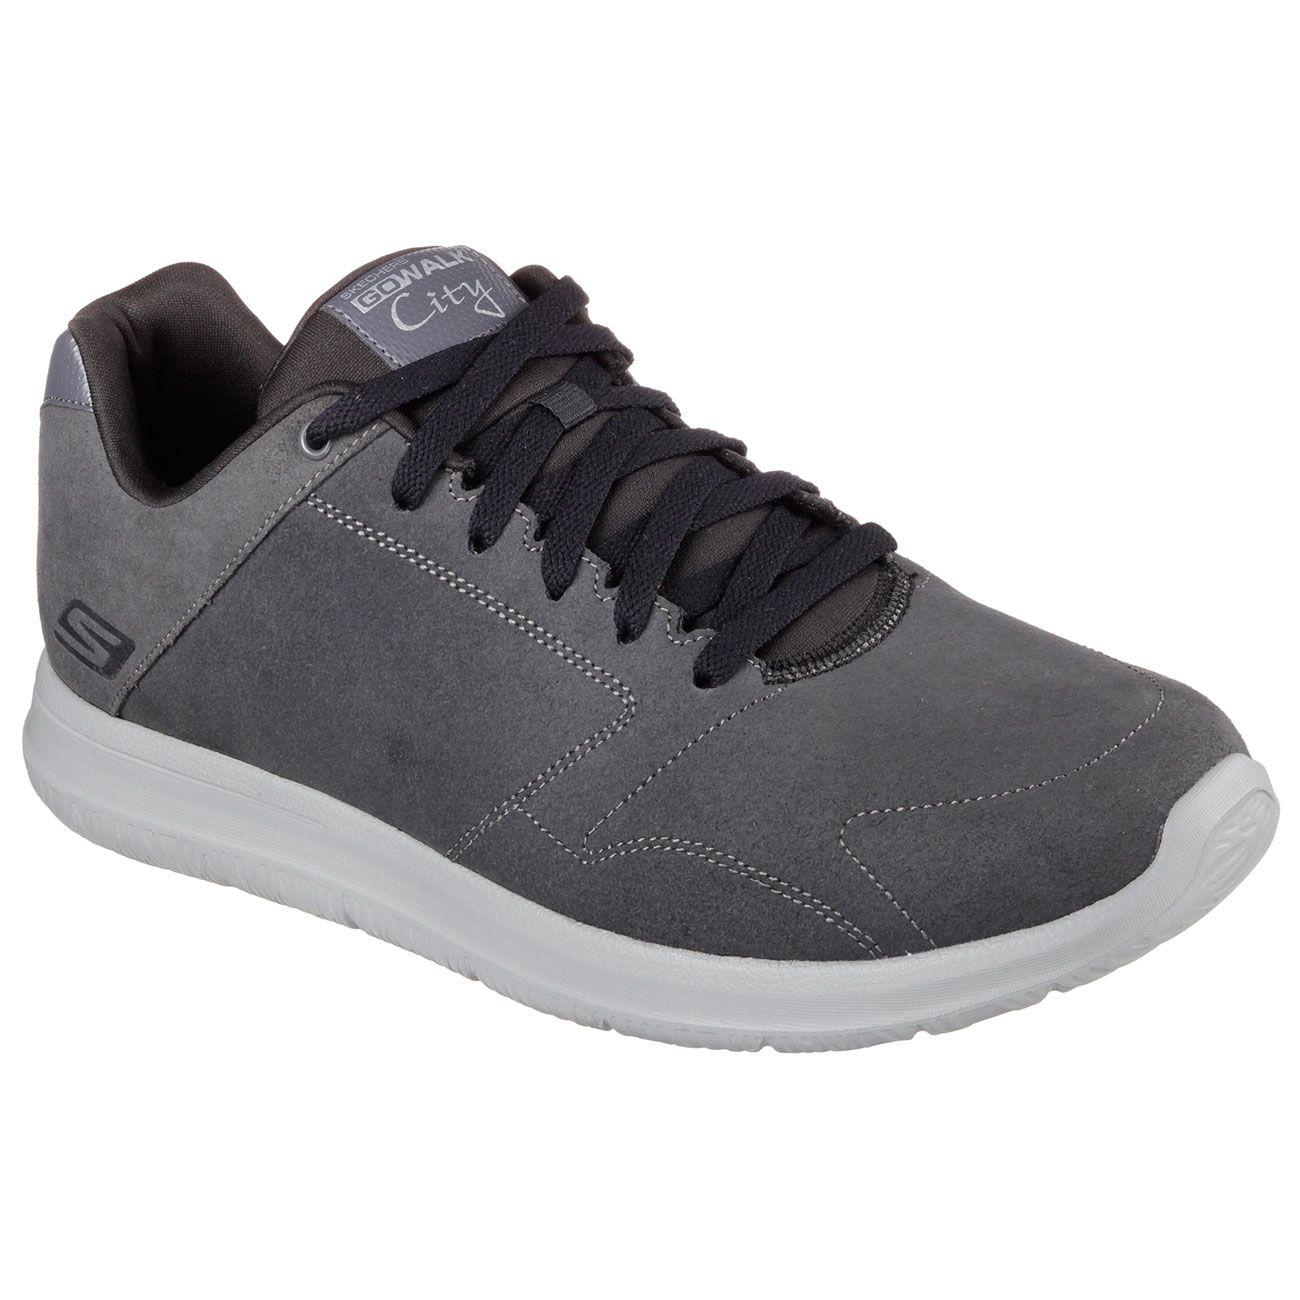 New Skechers Light Shoes